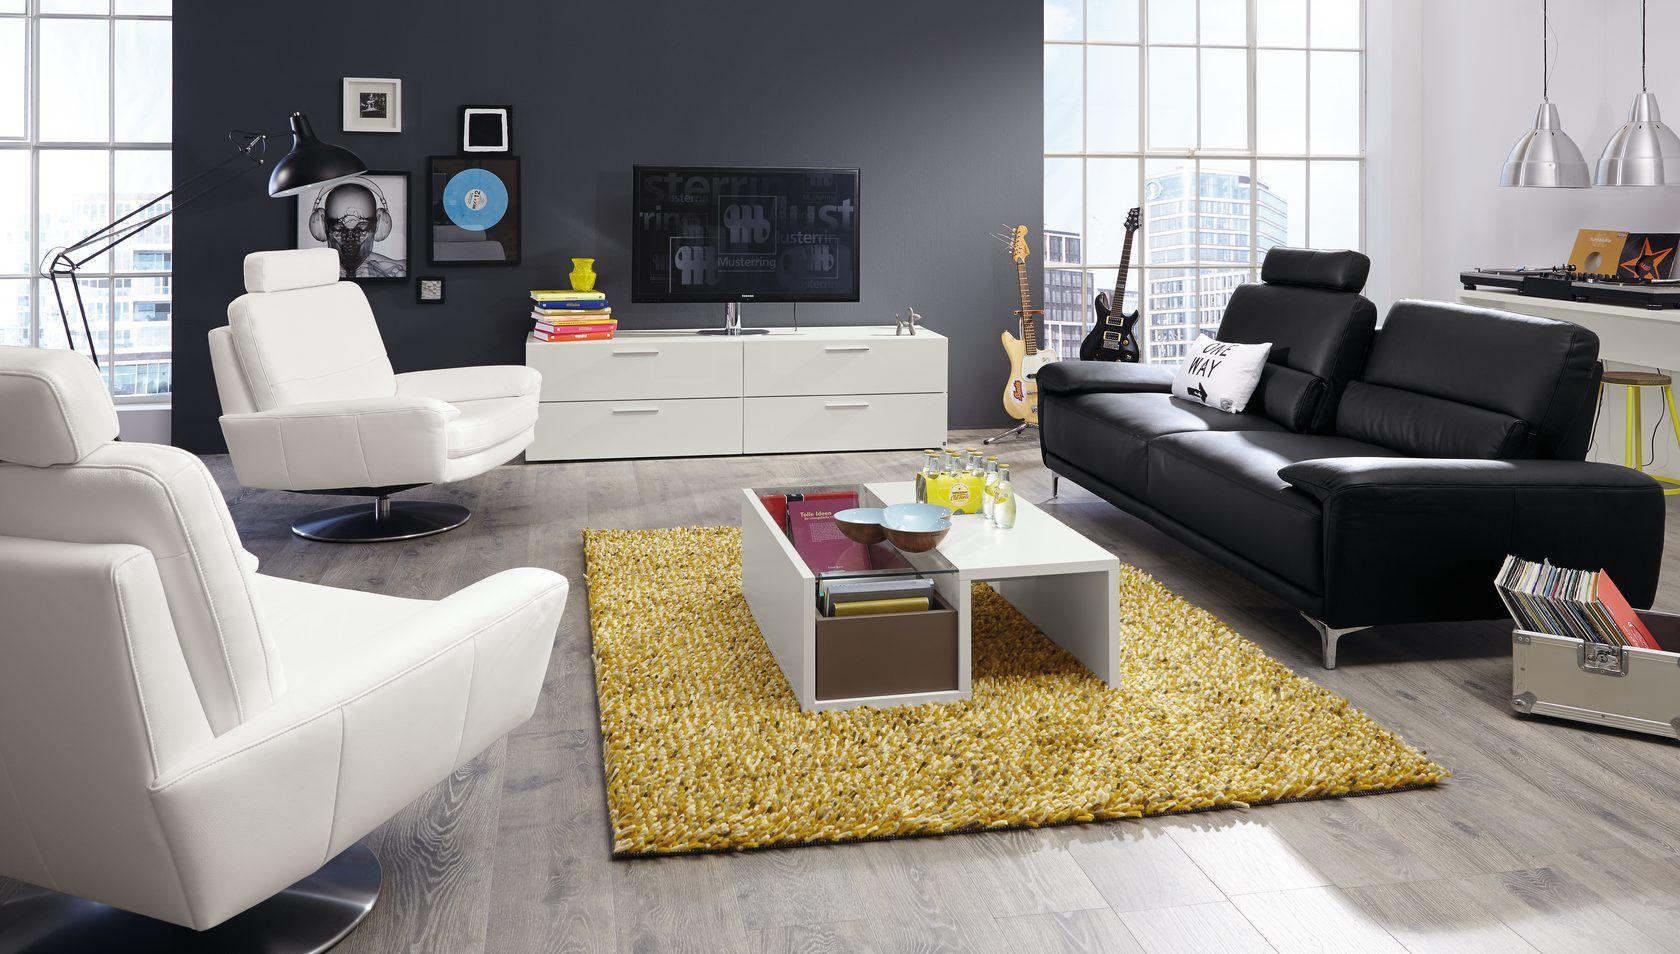 mr 4680 polsterm bel polsterm bel wohnwelten musterring international musterring m bel. Black Bedroom Furniture Sets. Home Design Ideas